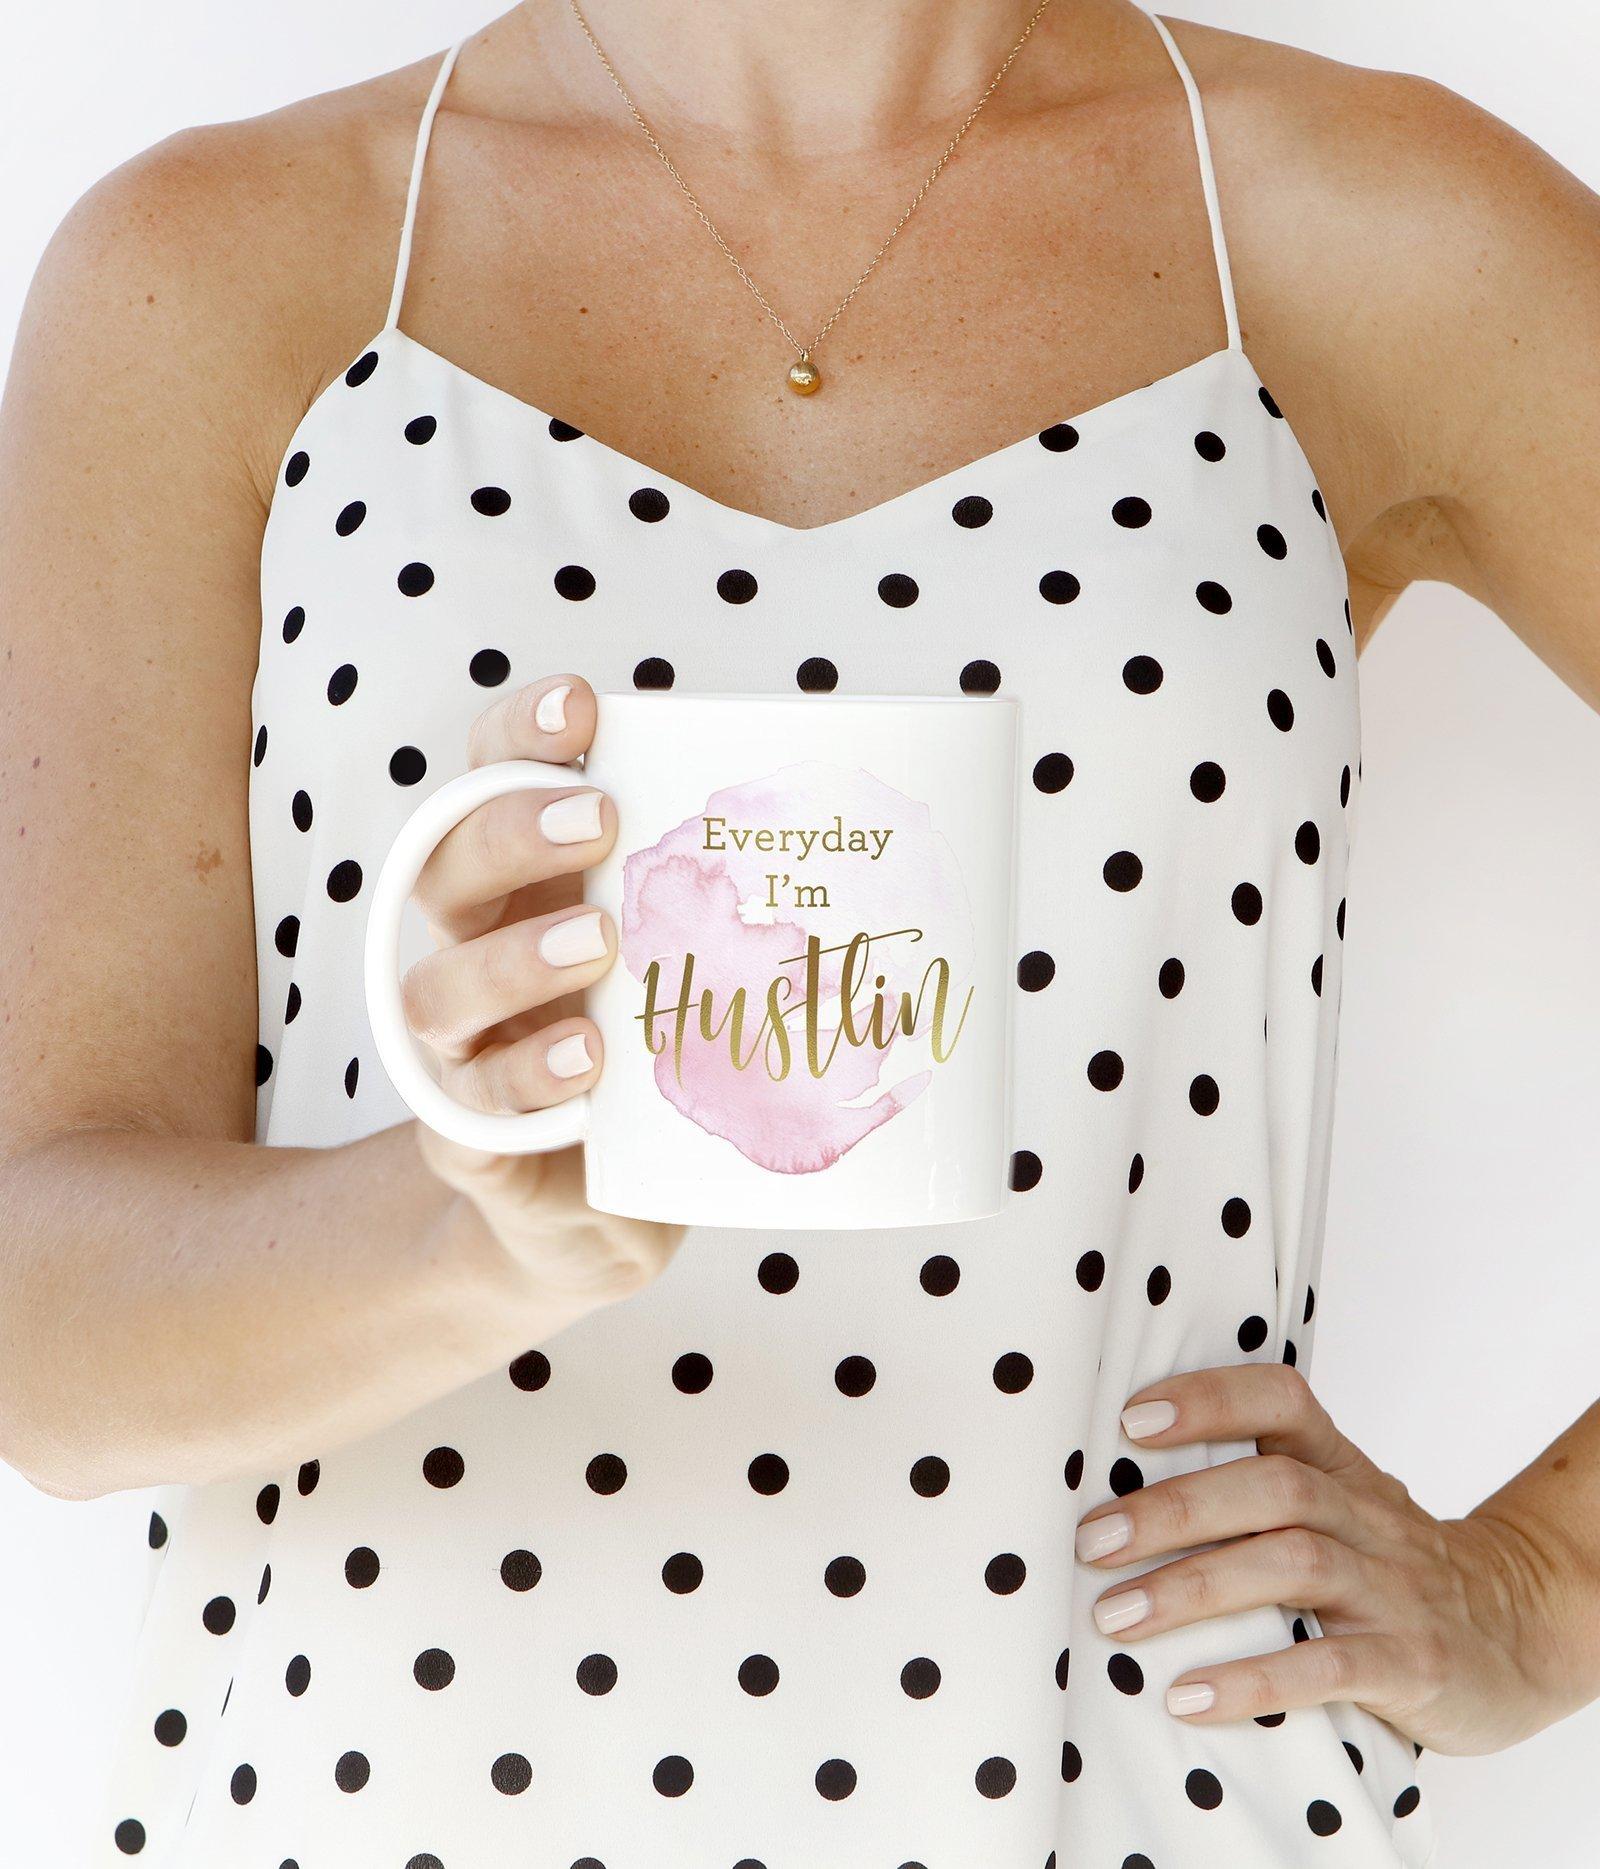 Everyday I'm Hustlin Coffee Mug Gift Idea for Motivation Encouragement Enthusiasm Inspiration Work Hard Hustle Boss Lady Girlboss Present 11oz Novelty Ceramic Tea Cup by Digibuddha DM0147